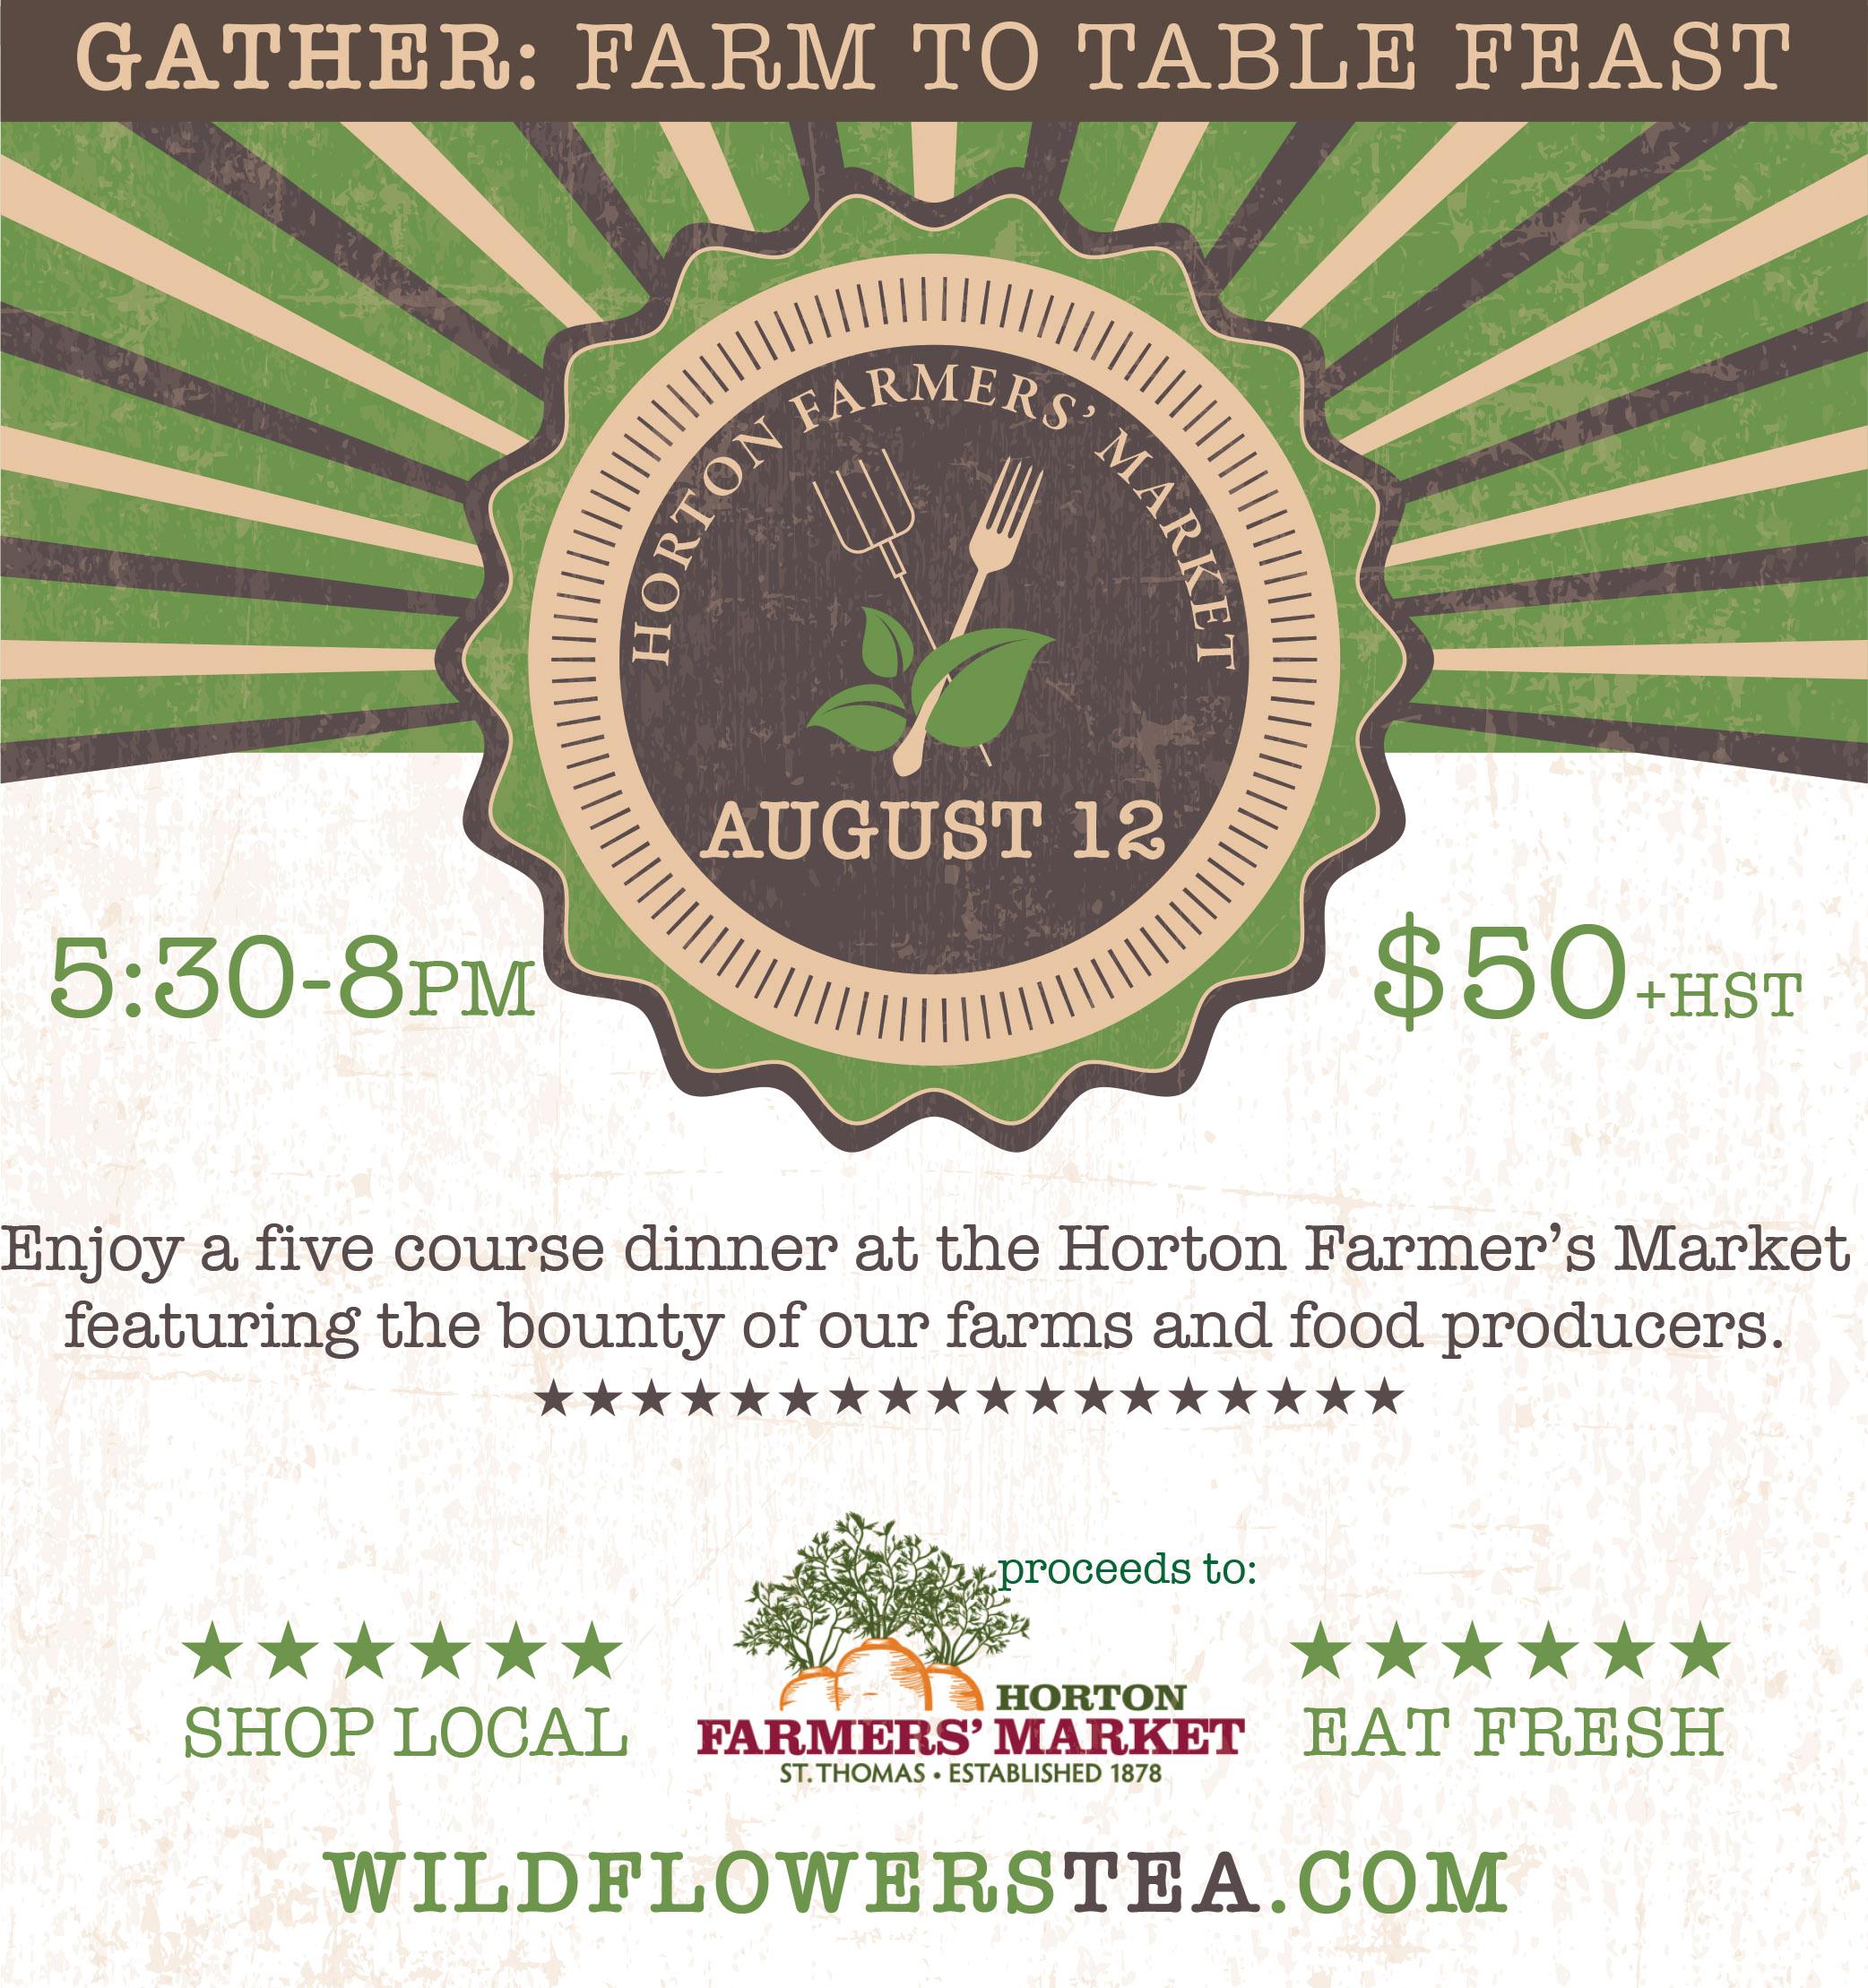 Gather: Farm to Table Feast at the Horton Farmers' Market